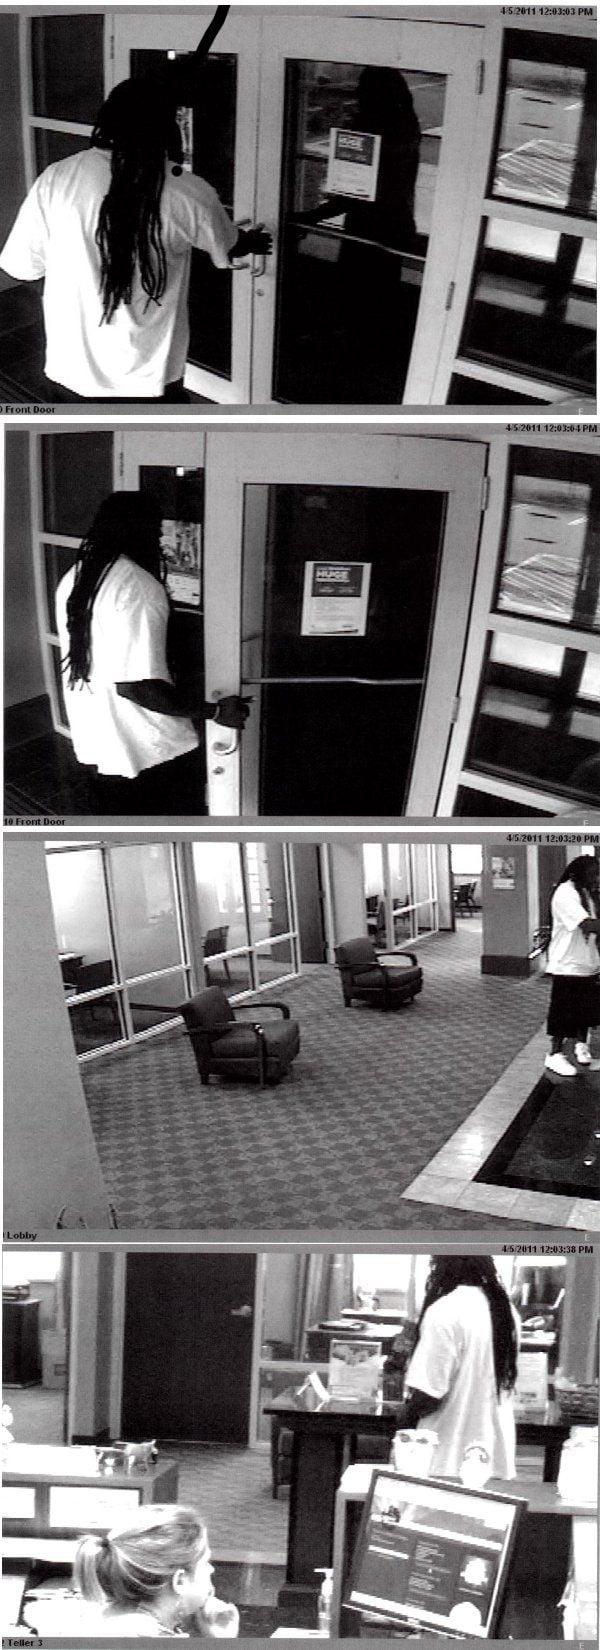 NBSC robbery suspect